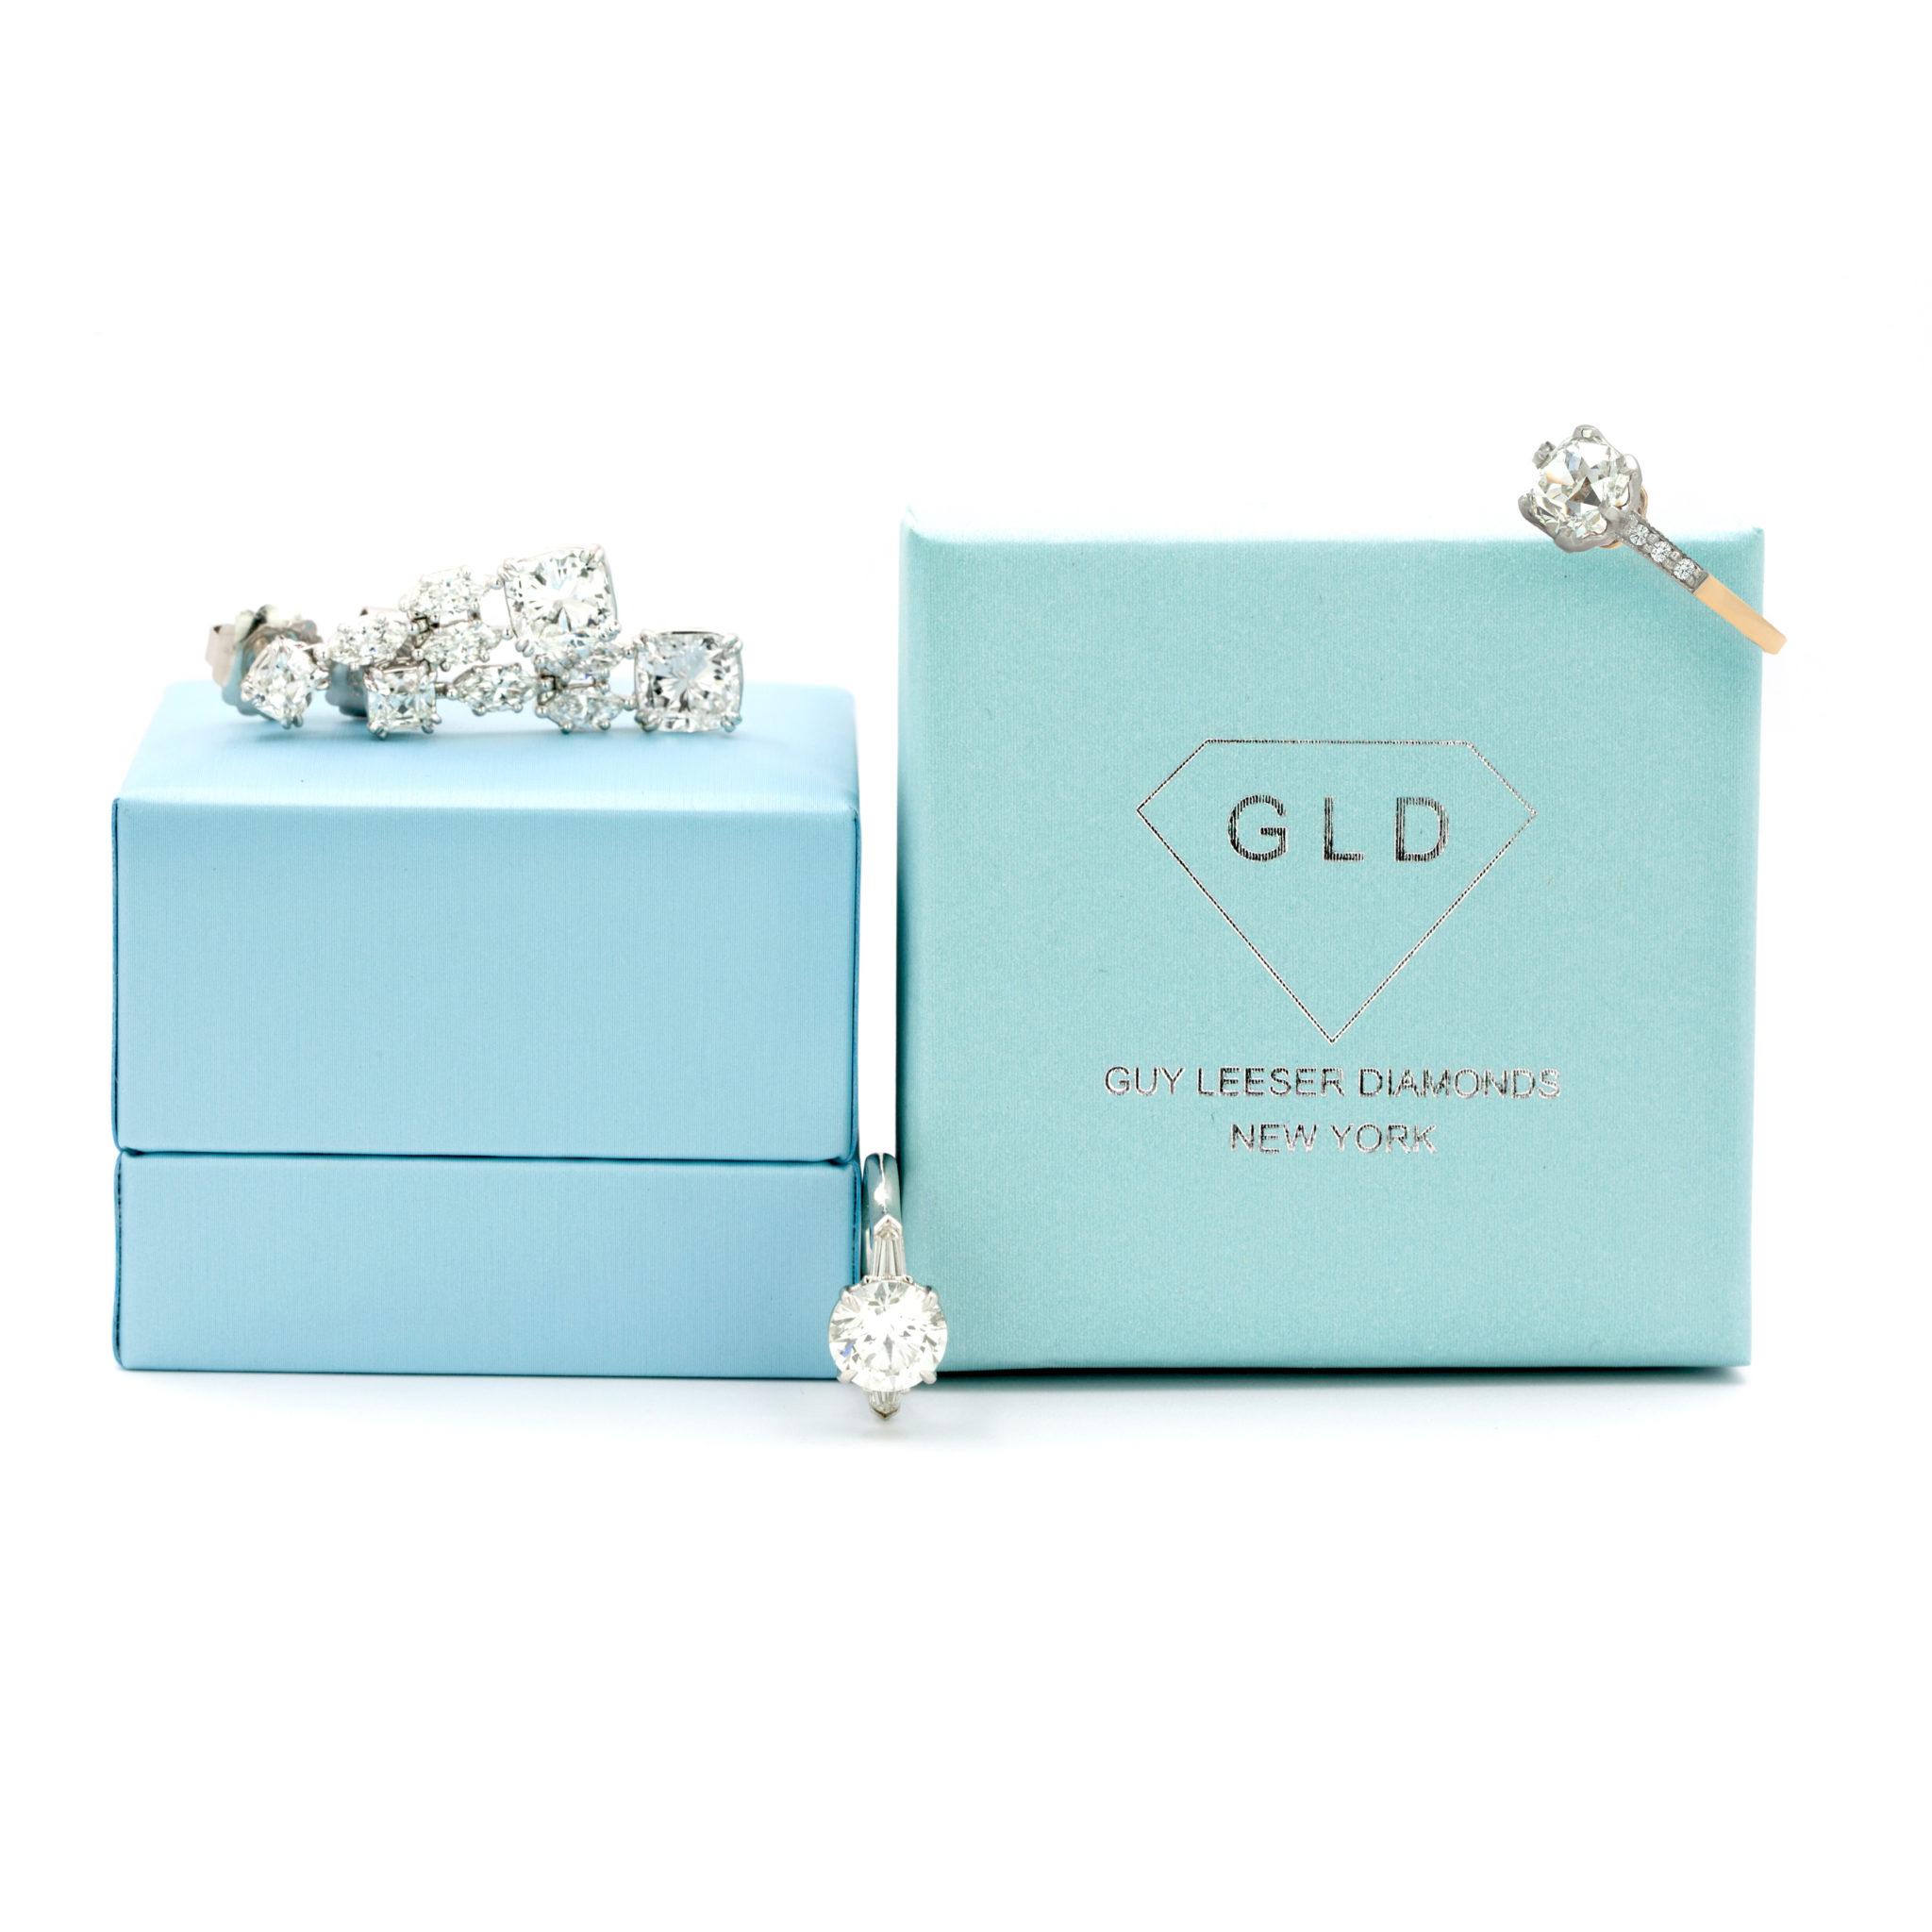 Leeser Diamonds – Jewelry Gallery – 9